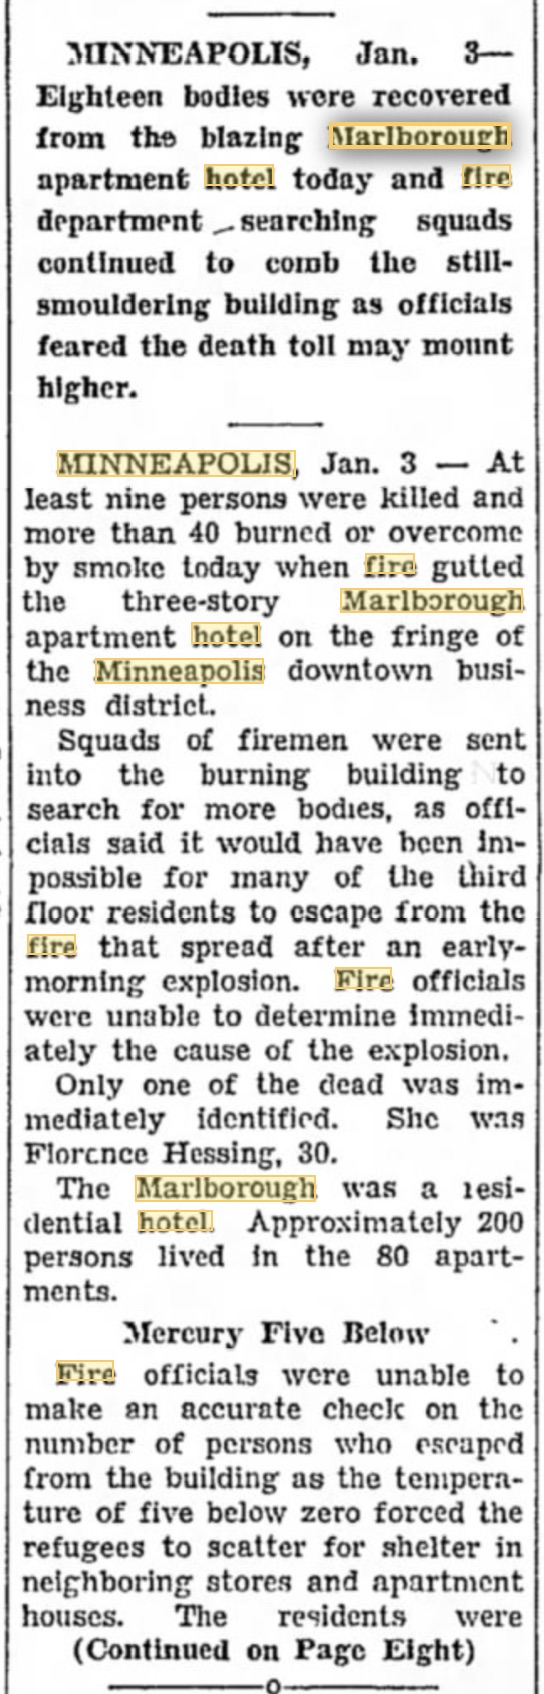 Circleville Herald June 3 1940 - 2